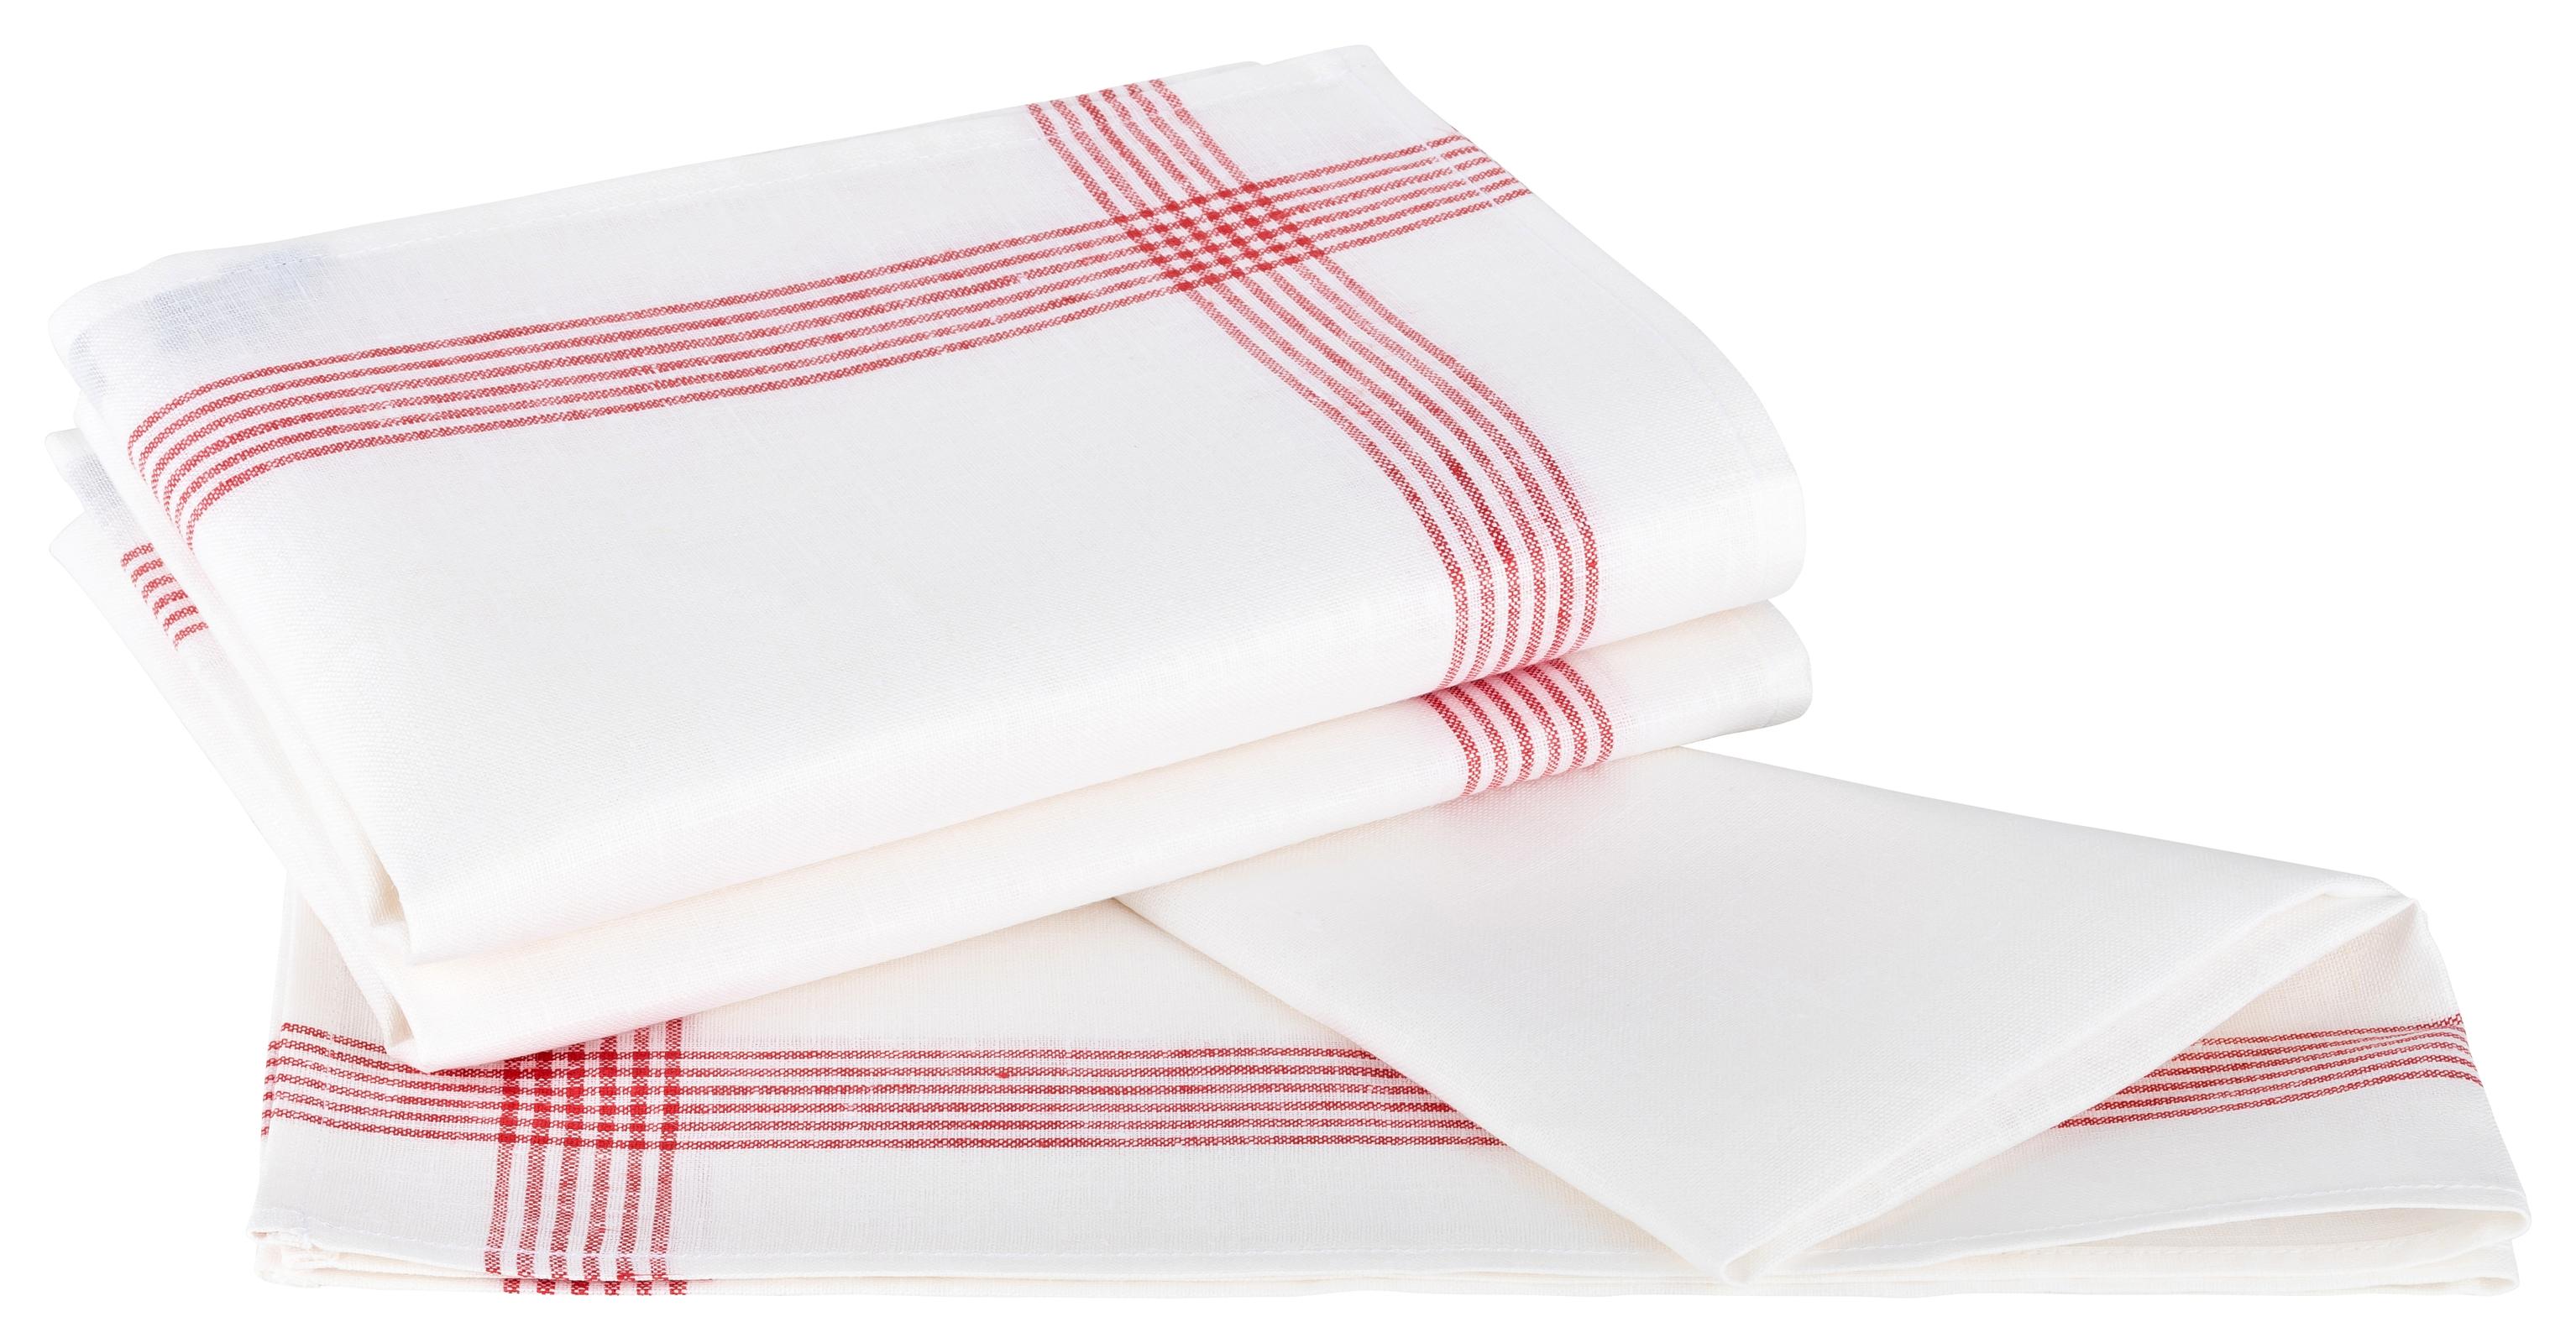 Küchentextilien - Kracht 3er Pack Geschirrtücher Gläsertücher 100 Leinen Reinleinen 50x70 Rahmen 2 263 10 weiß rot  - Onlineshop PremiumShop321